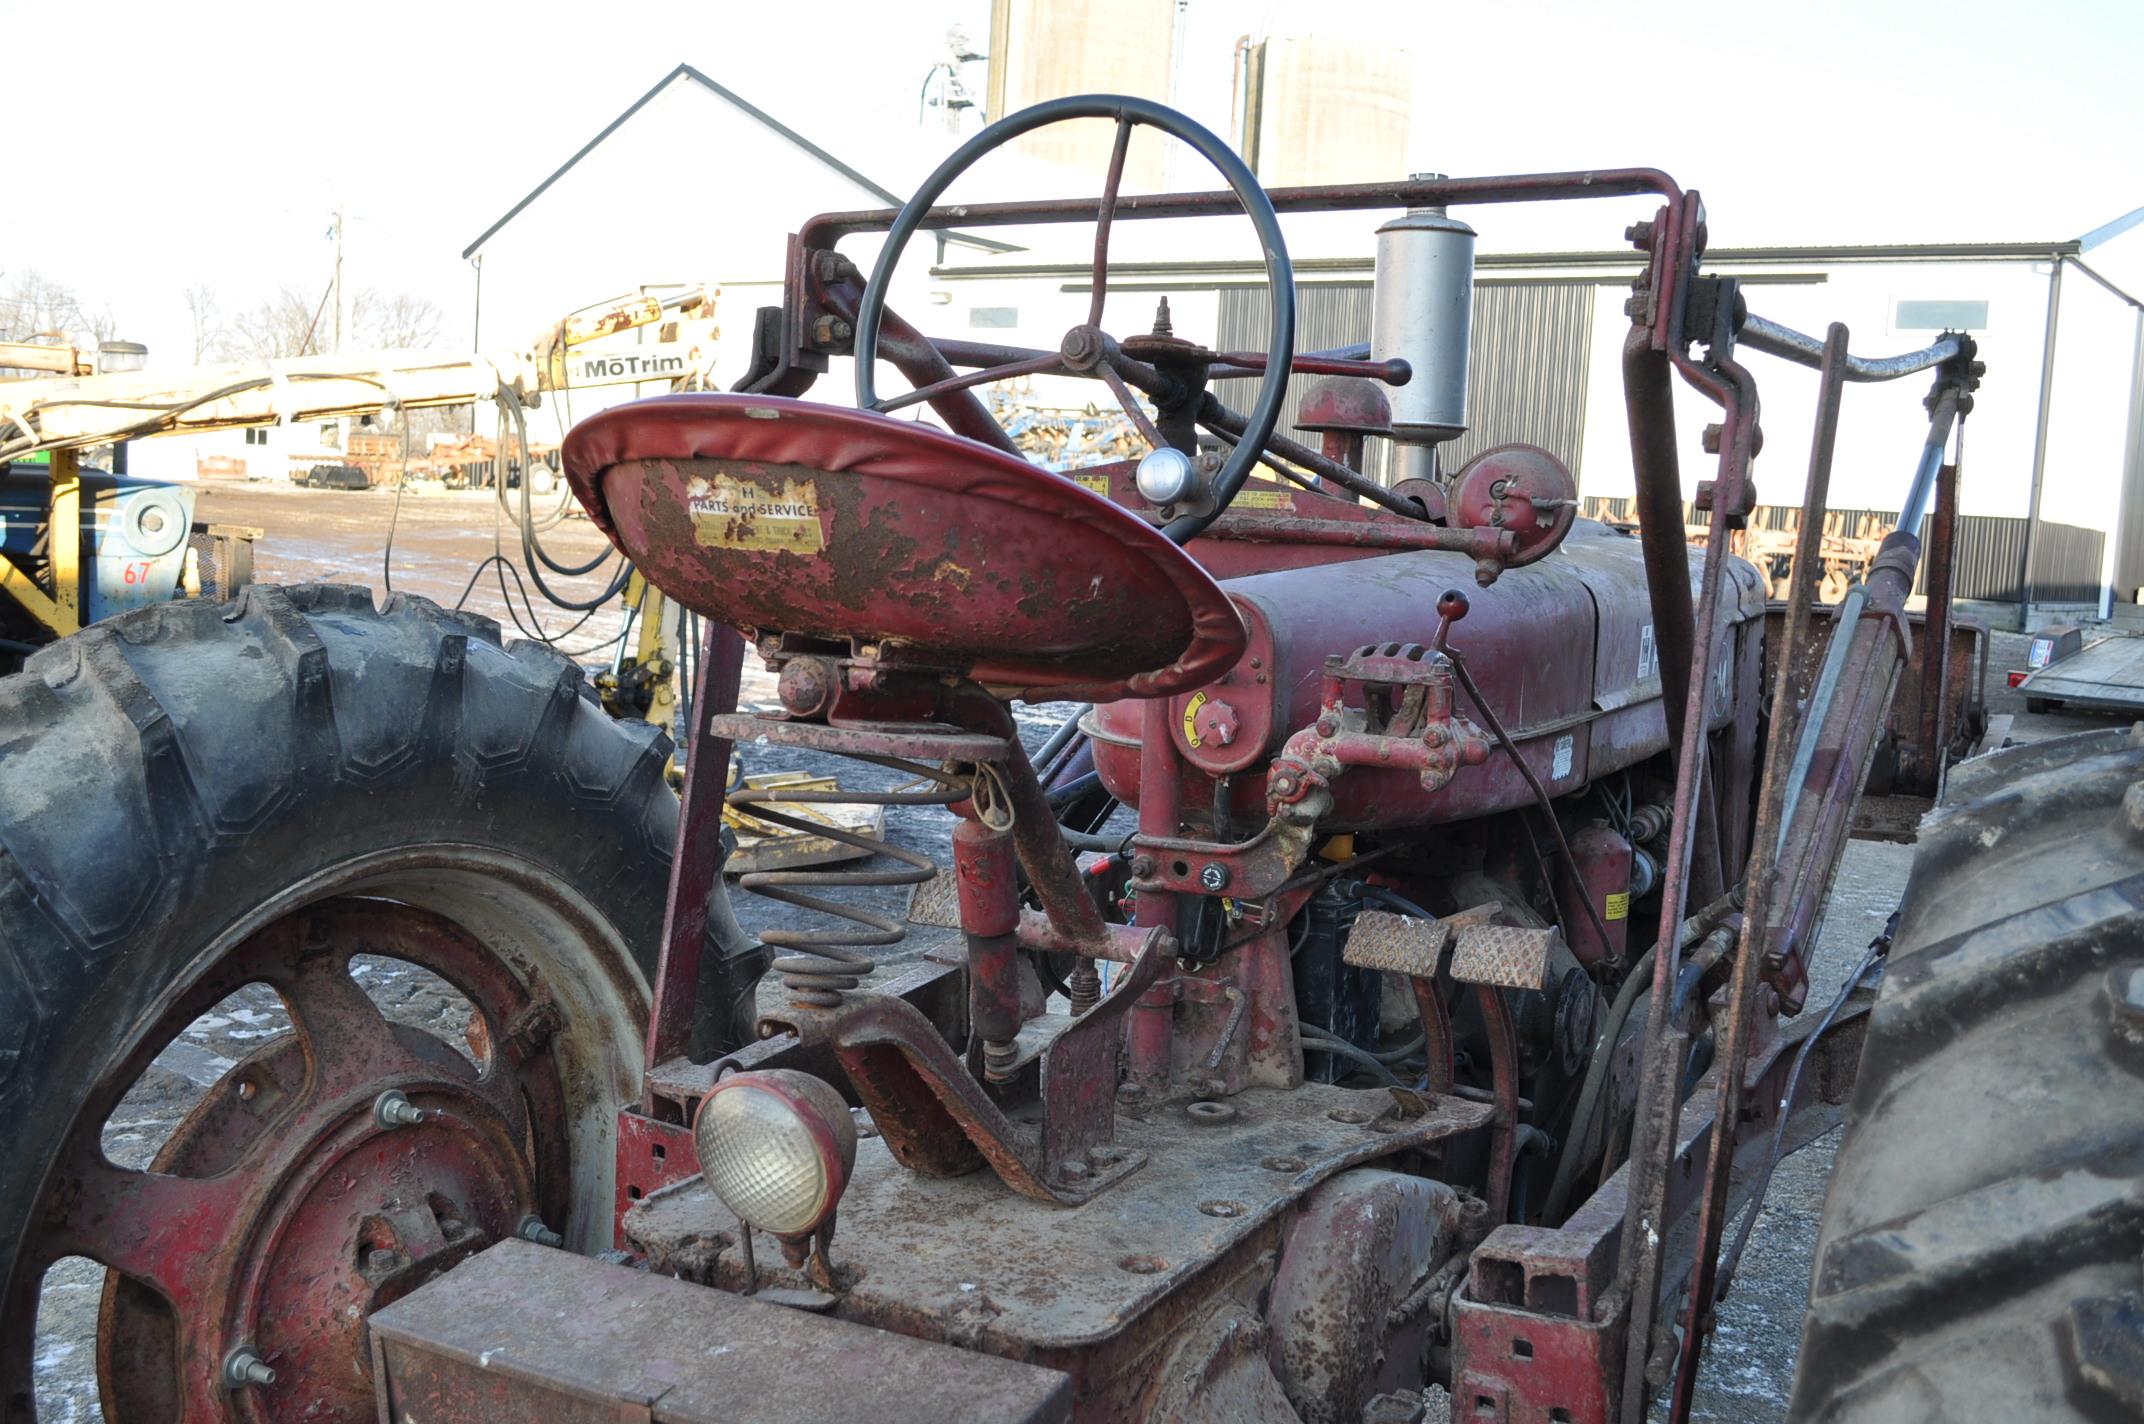 Farmall M tractor, 13.6-38 rear, narrow front, gasoline, loader, 540 PTO, SN FBK276 - Image 9 of 11